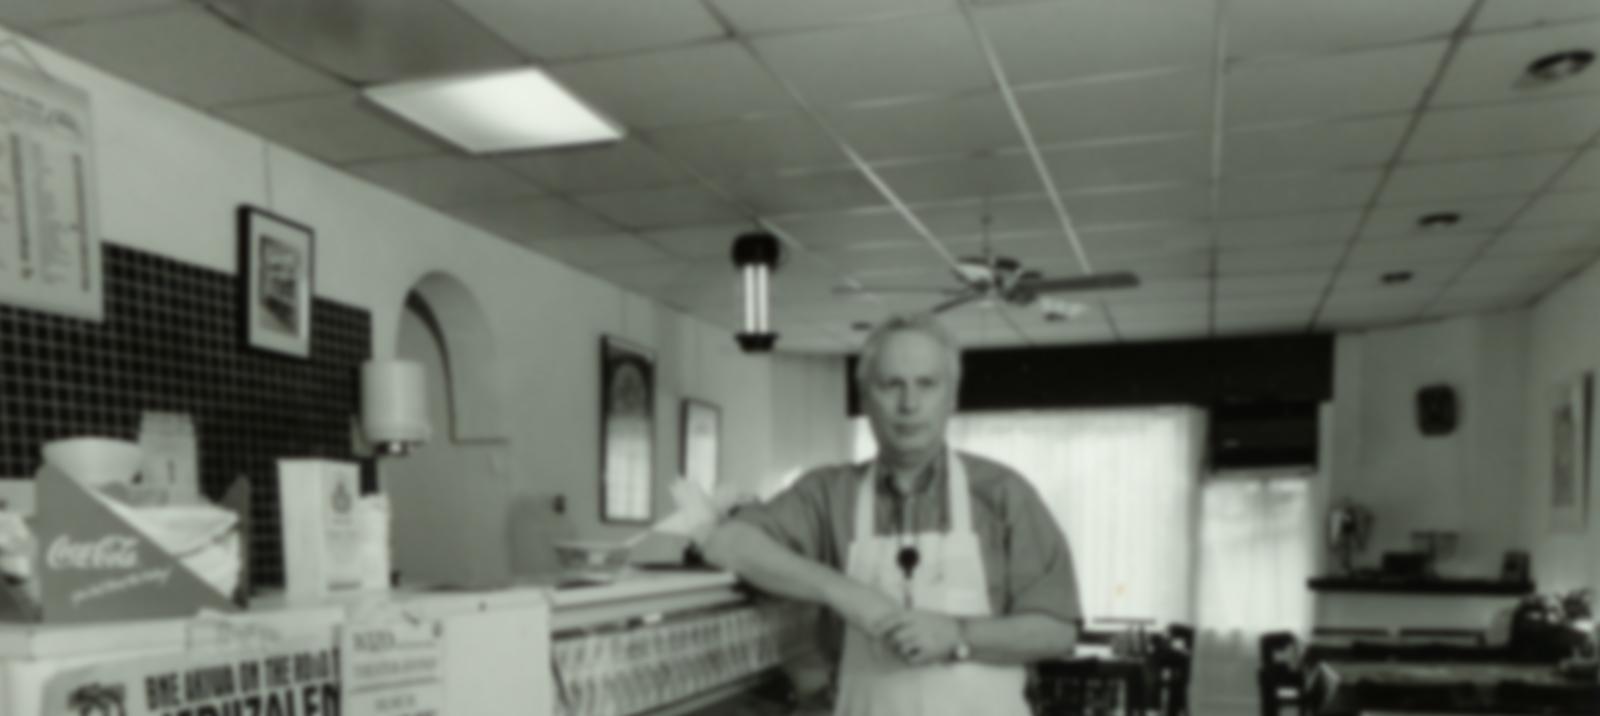 Sal Meyer